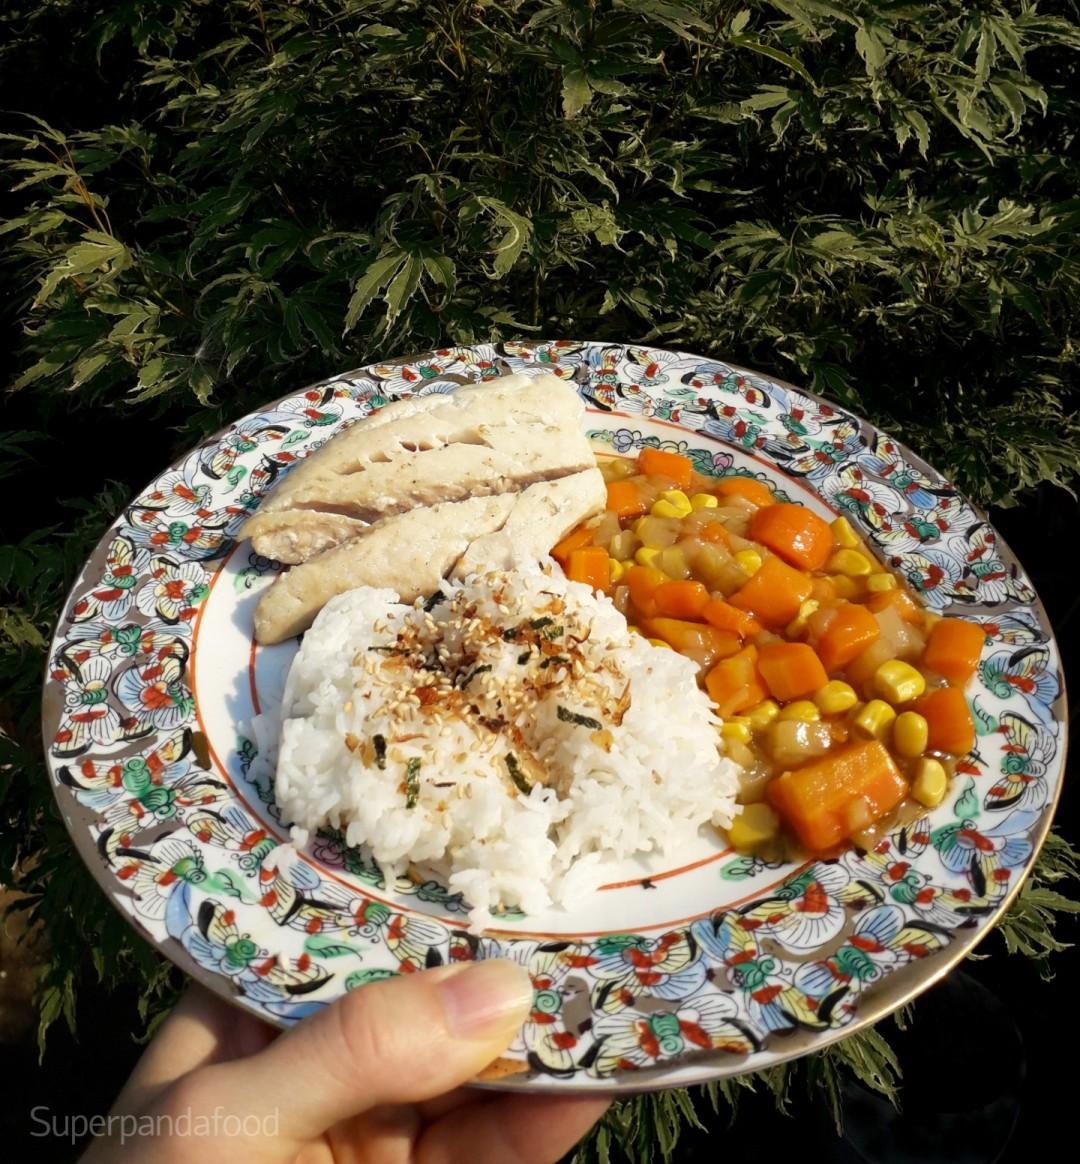 Koolvis met wortel, courgette, maïs, rijst en furikake - verkoelende voeding tijdens hittegolf